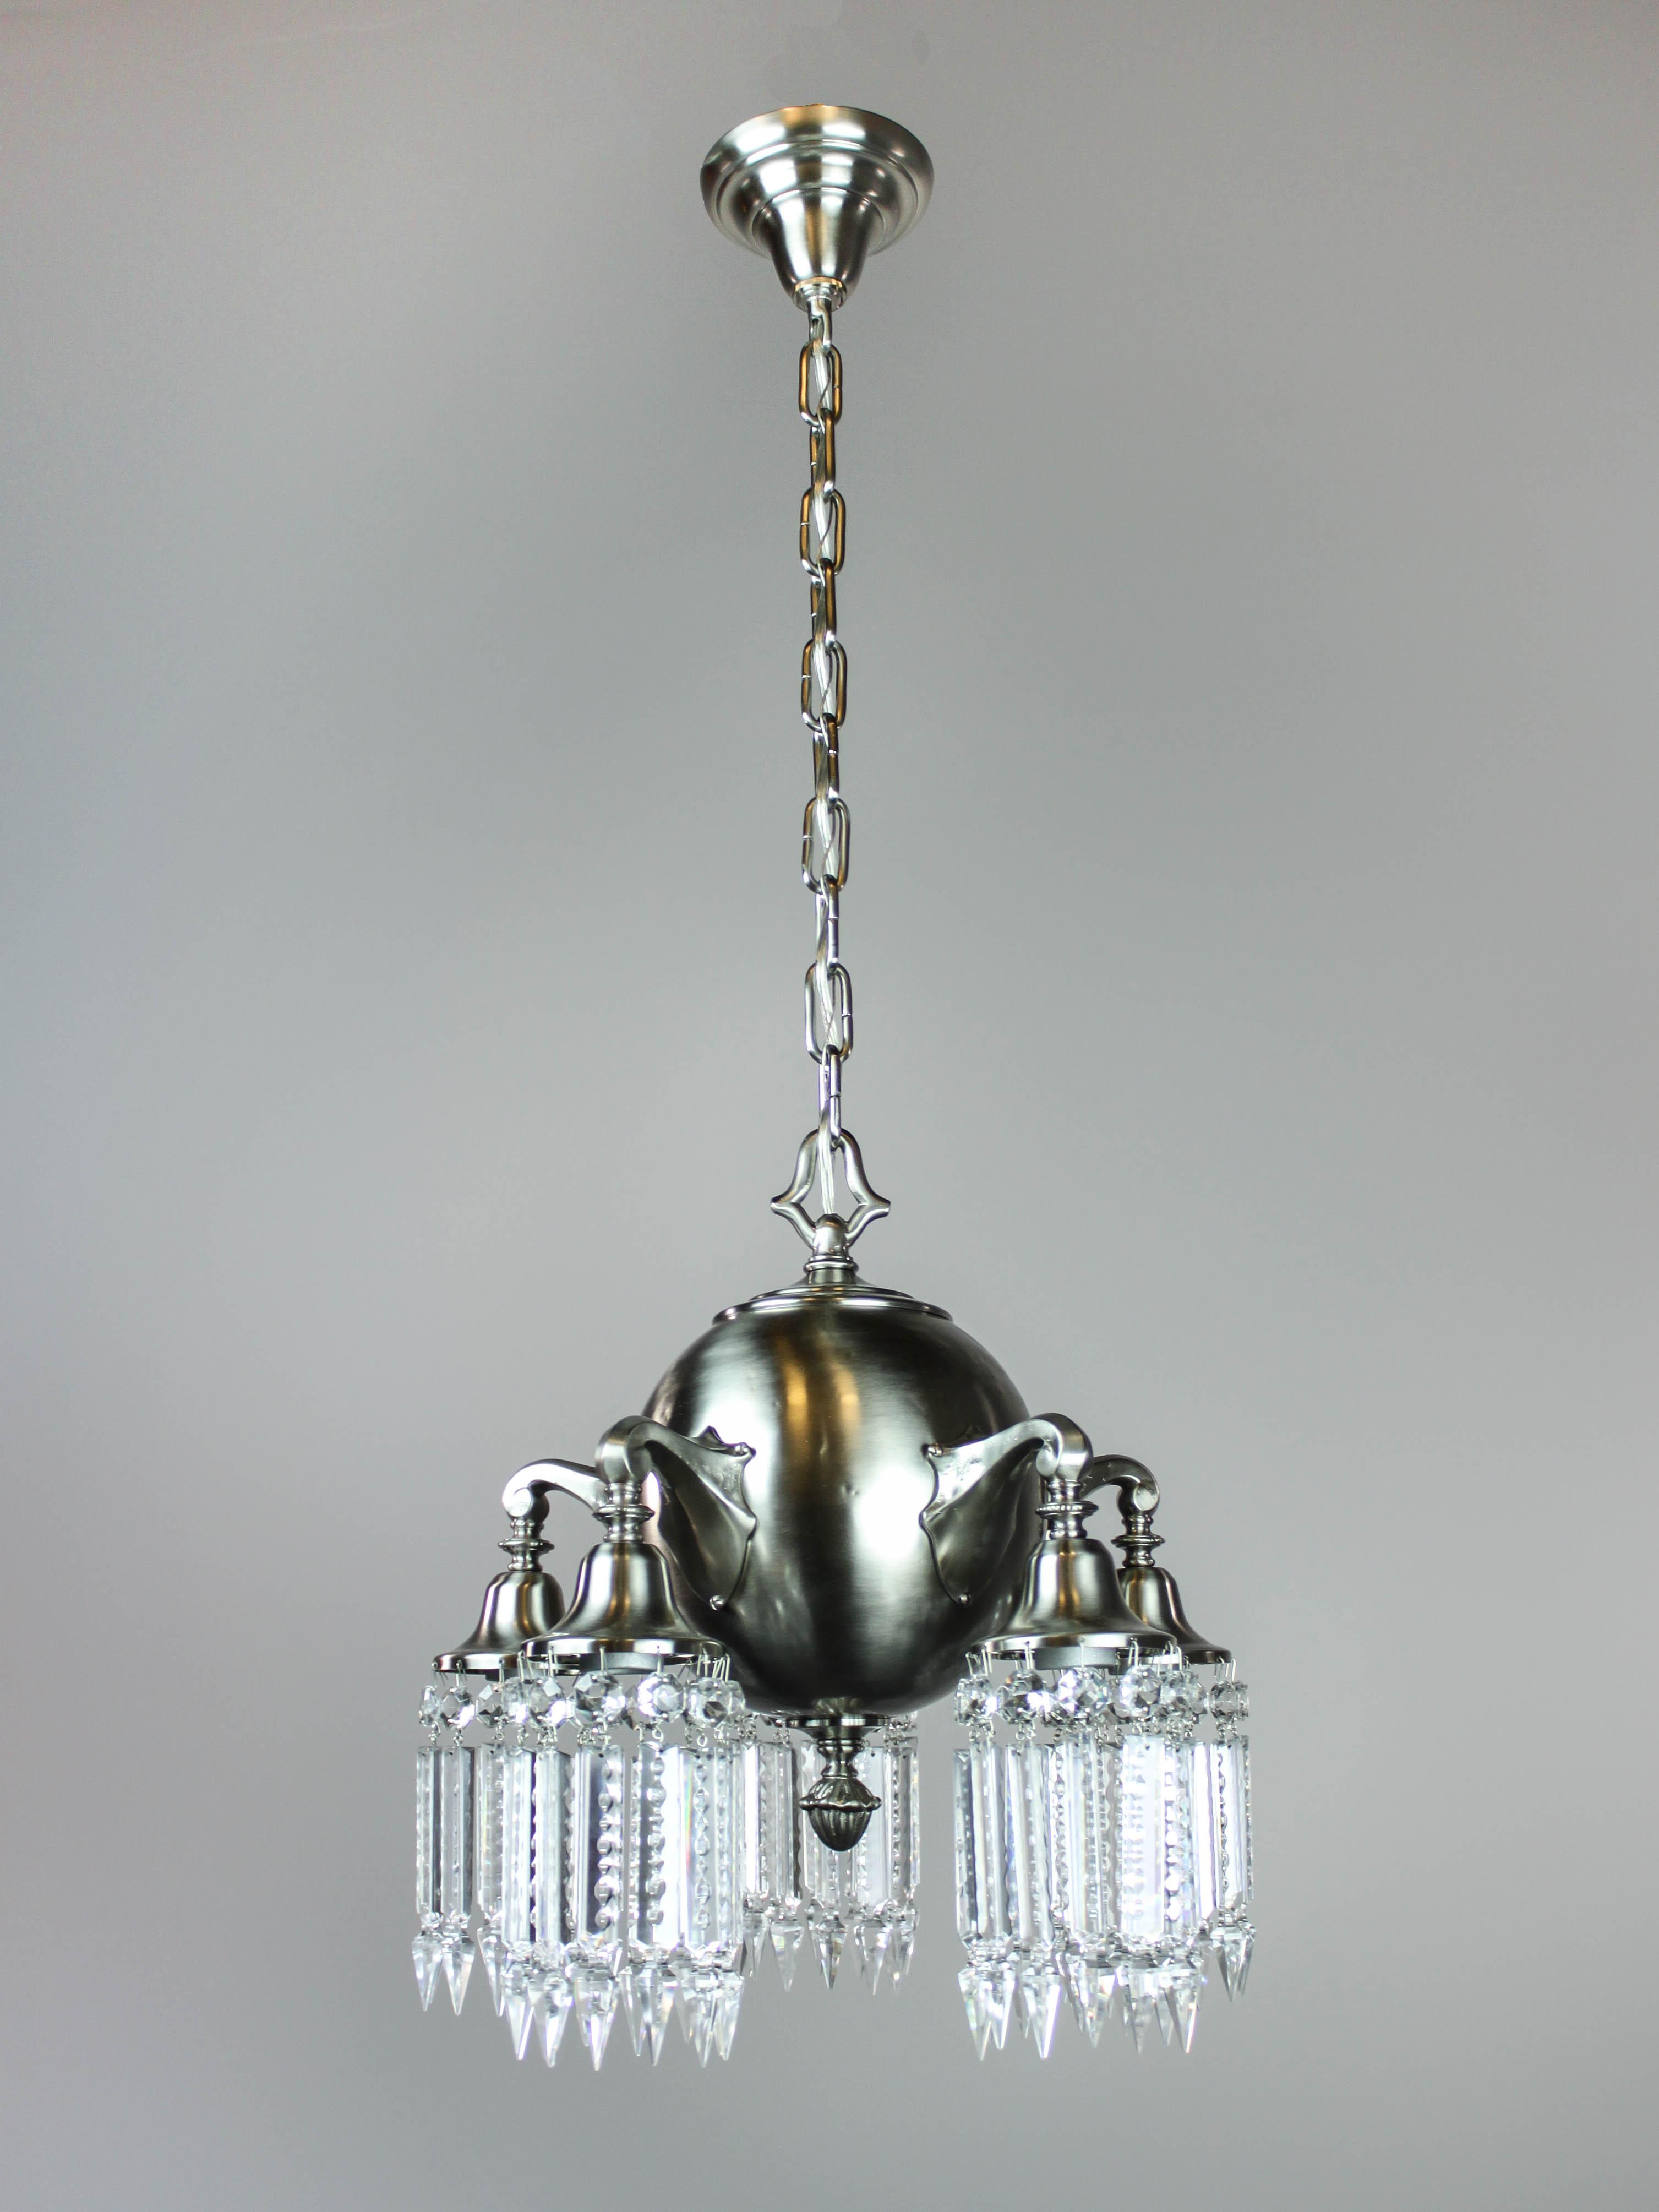 Nickel Plated Brass Crystal Light Fixture 5 Light